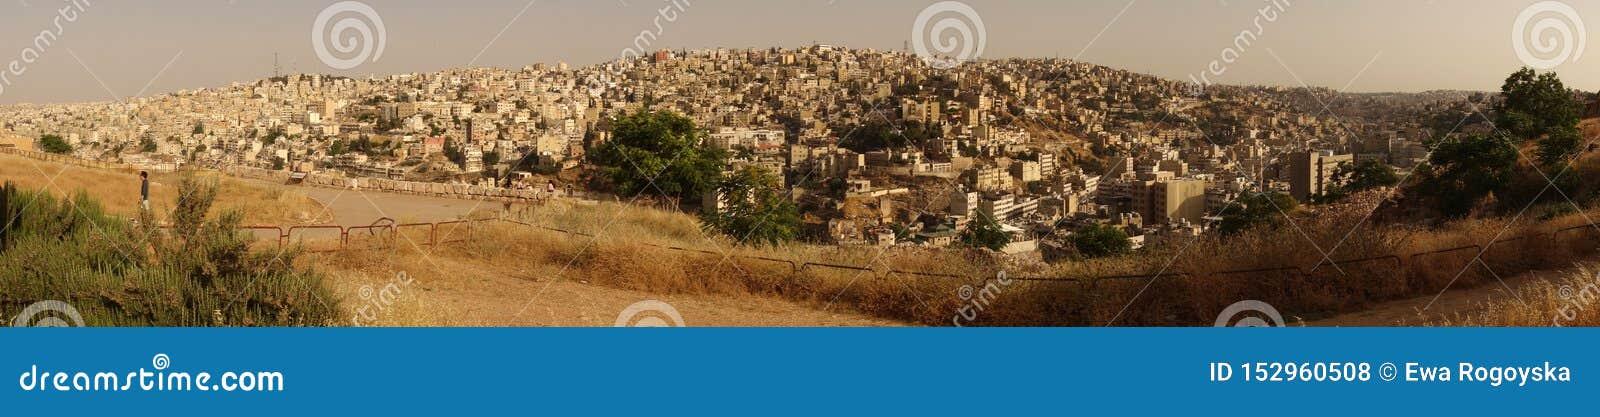 Vecchia citt? di Amman